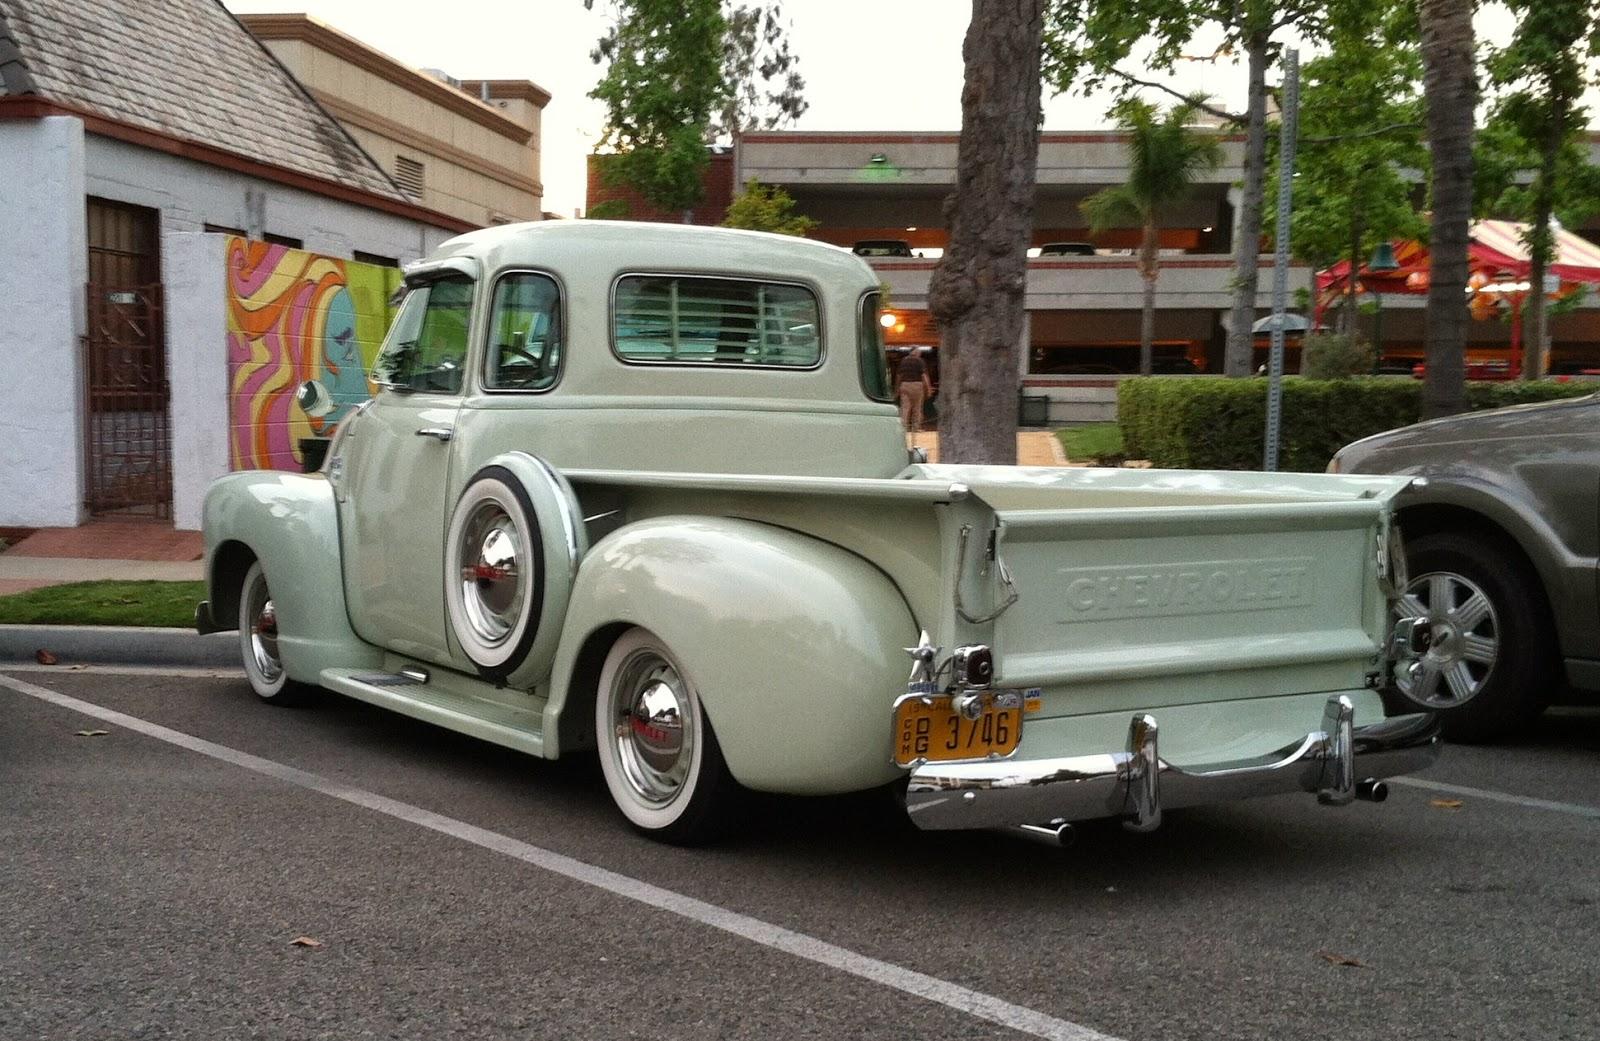 Truck 1949 chevy panel truck : Nostalgia on Wheels: Amazing 1949 Chevy Truck